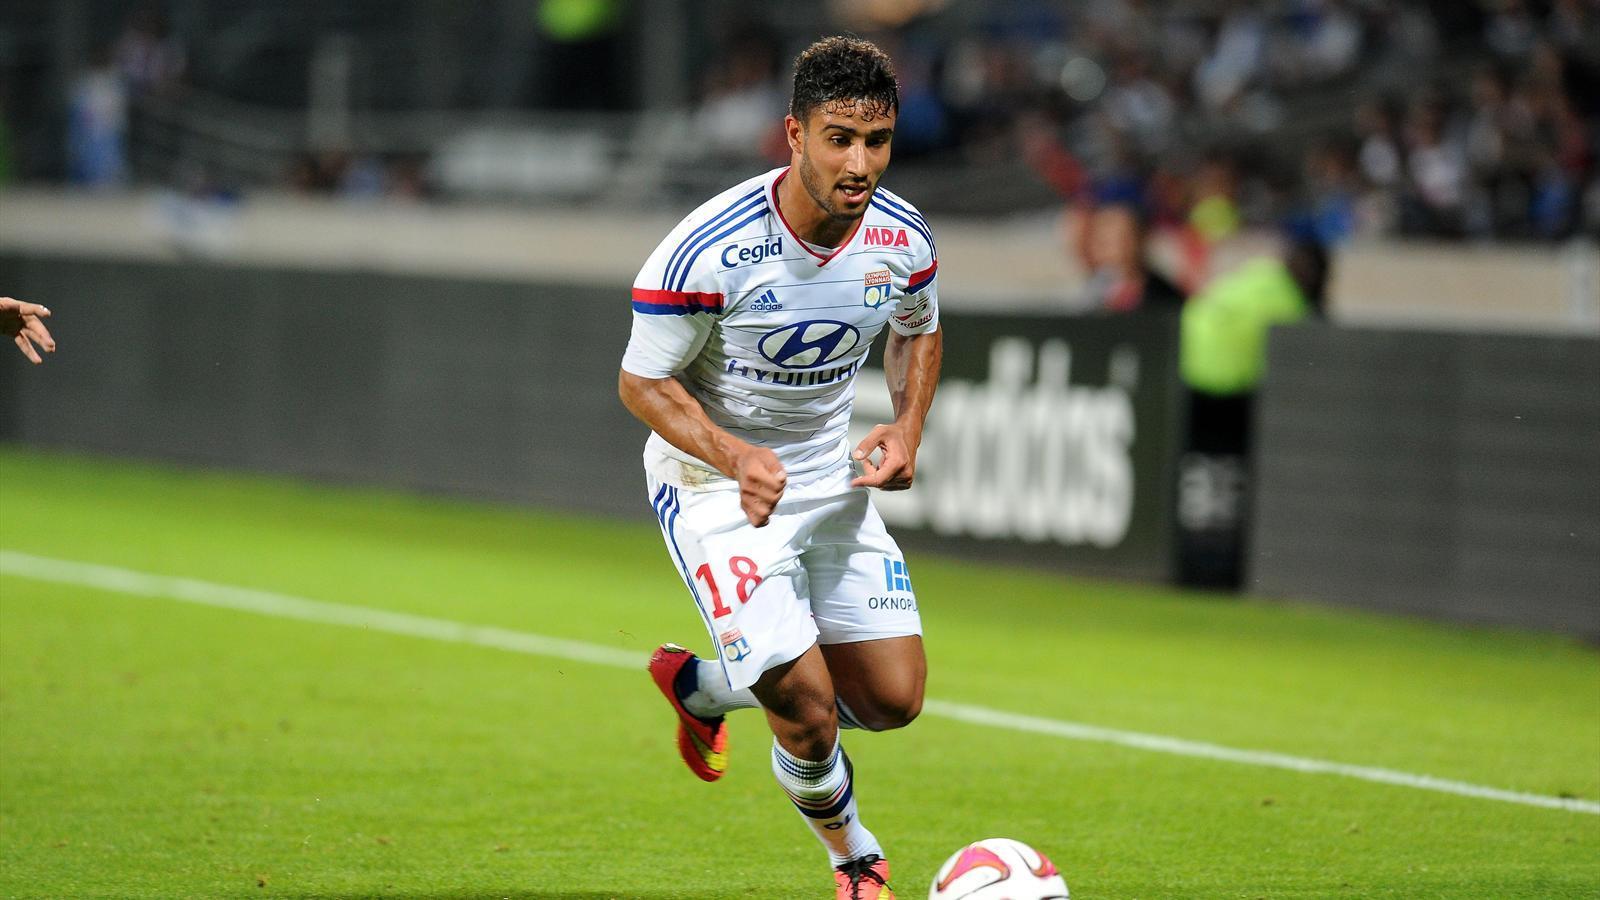 Sempreinter Mercato Player Profile: The Next Big French Thing?